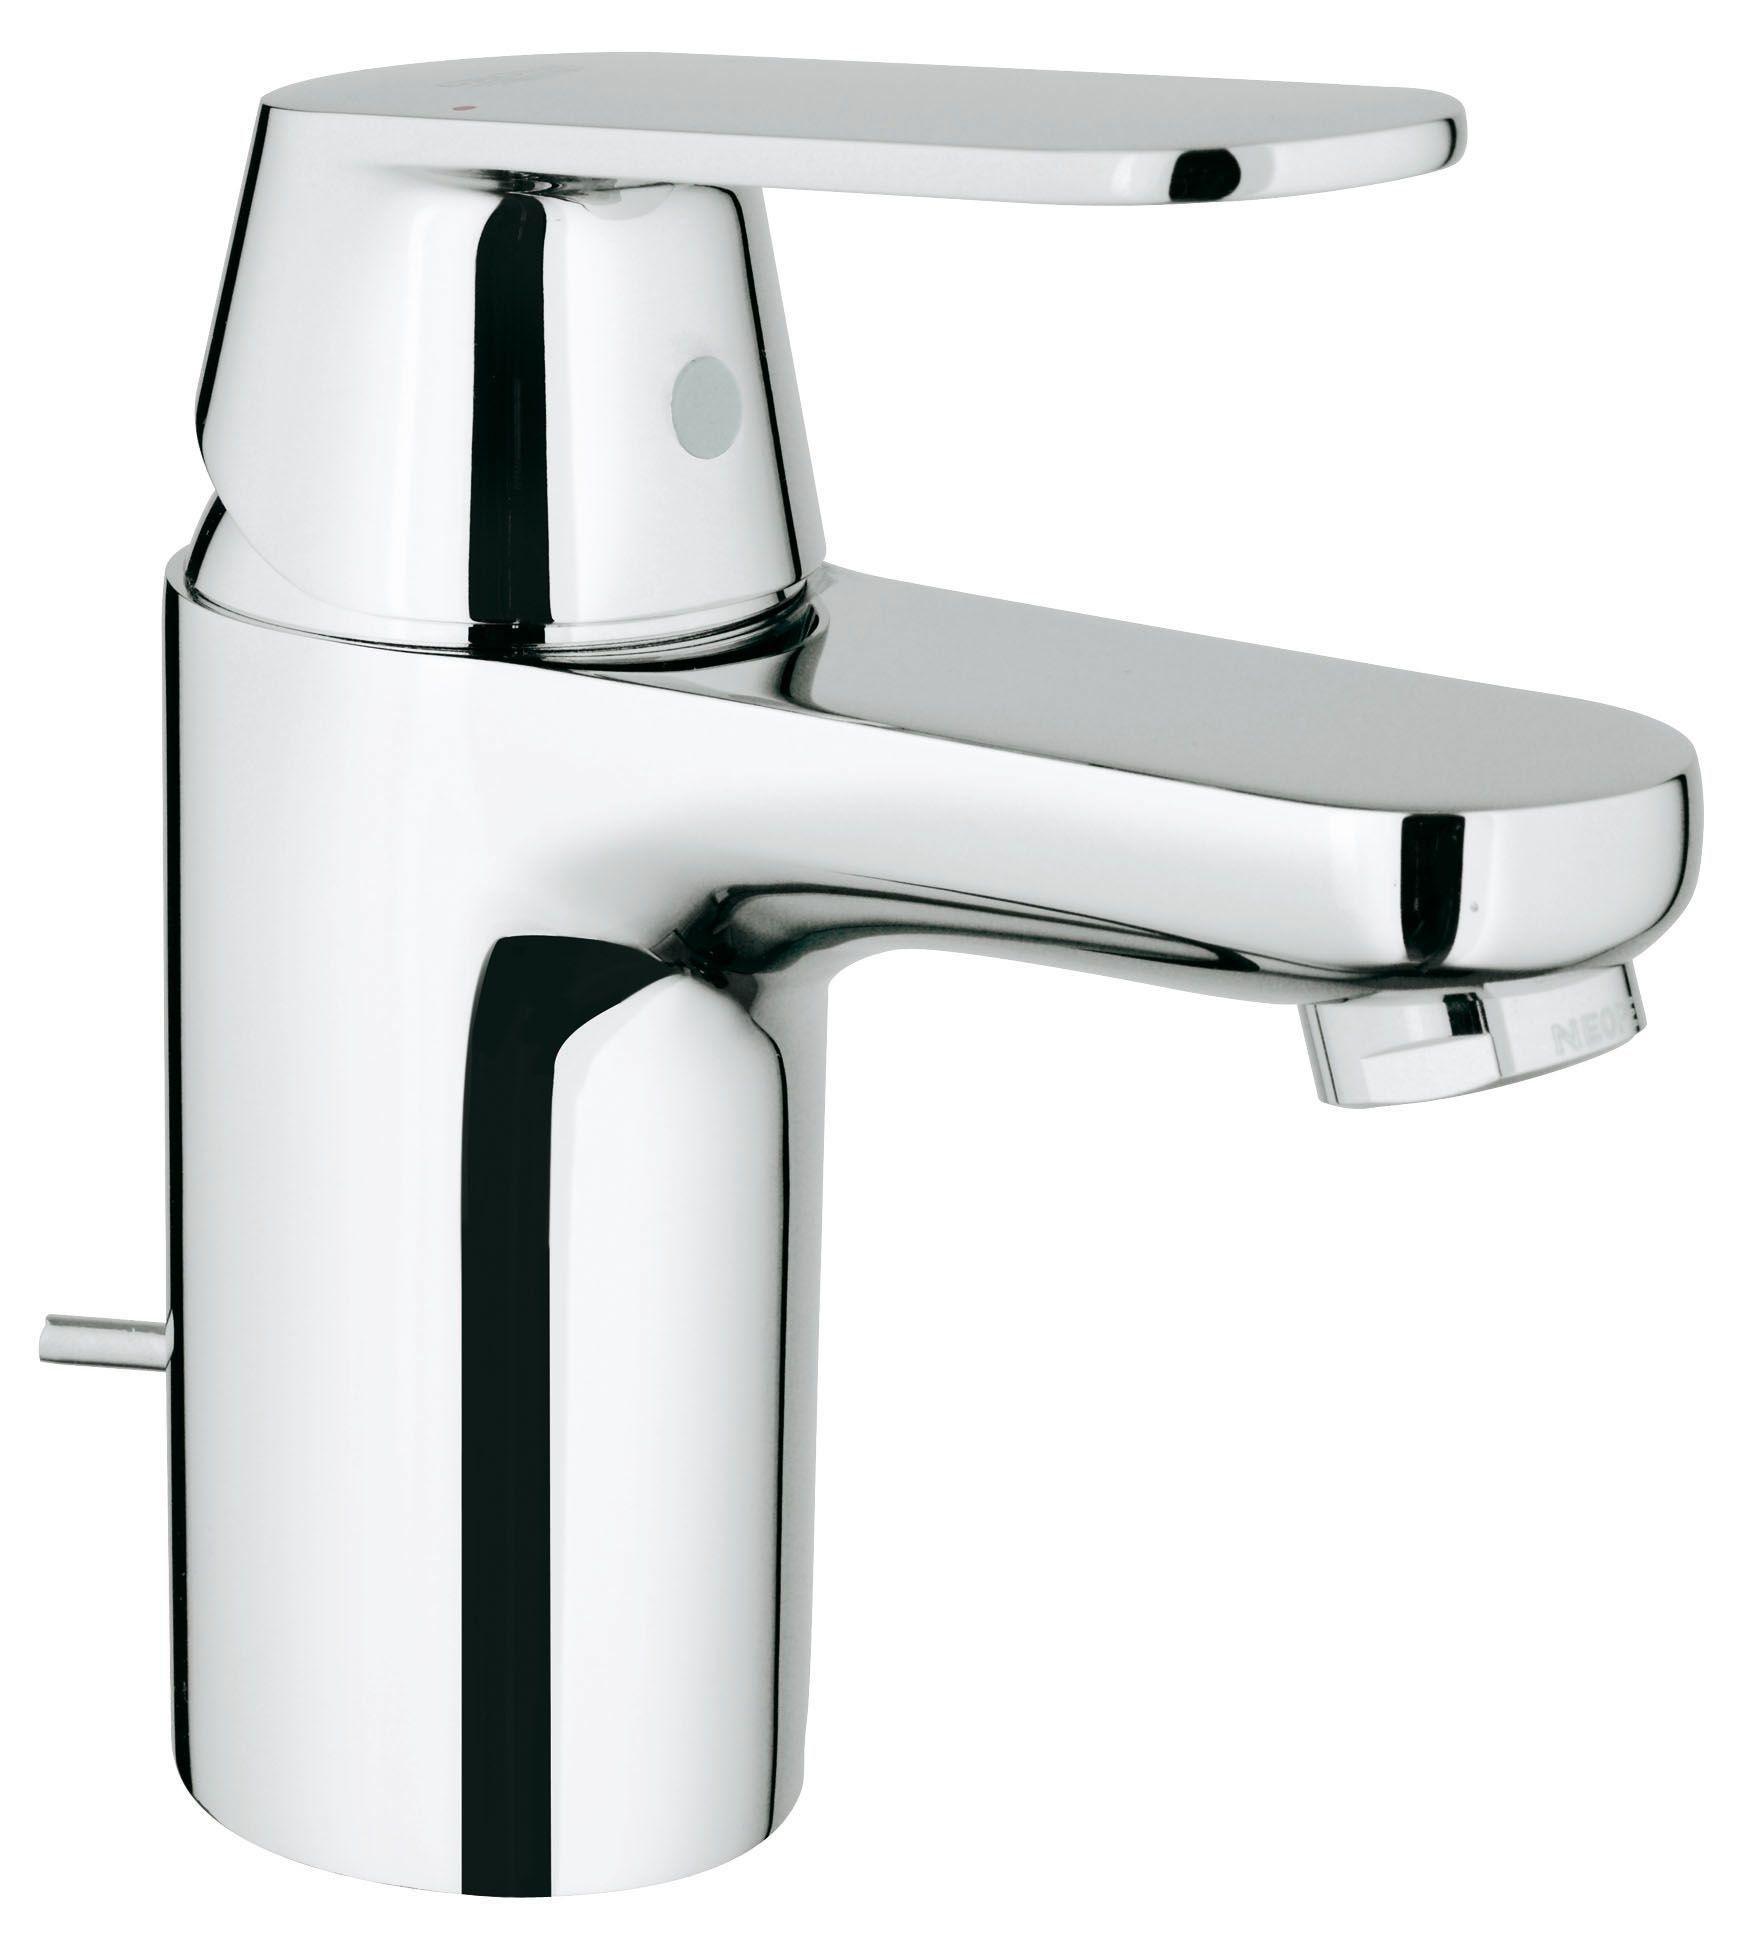 Grohe 32875000 Eurosmart Cosmo Centerset Lavatory Faucet